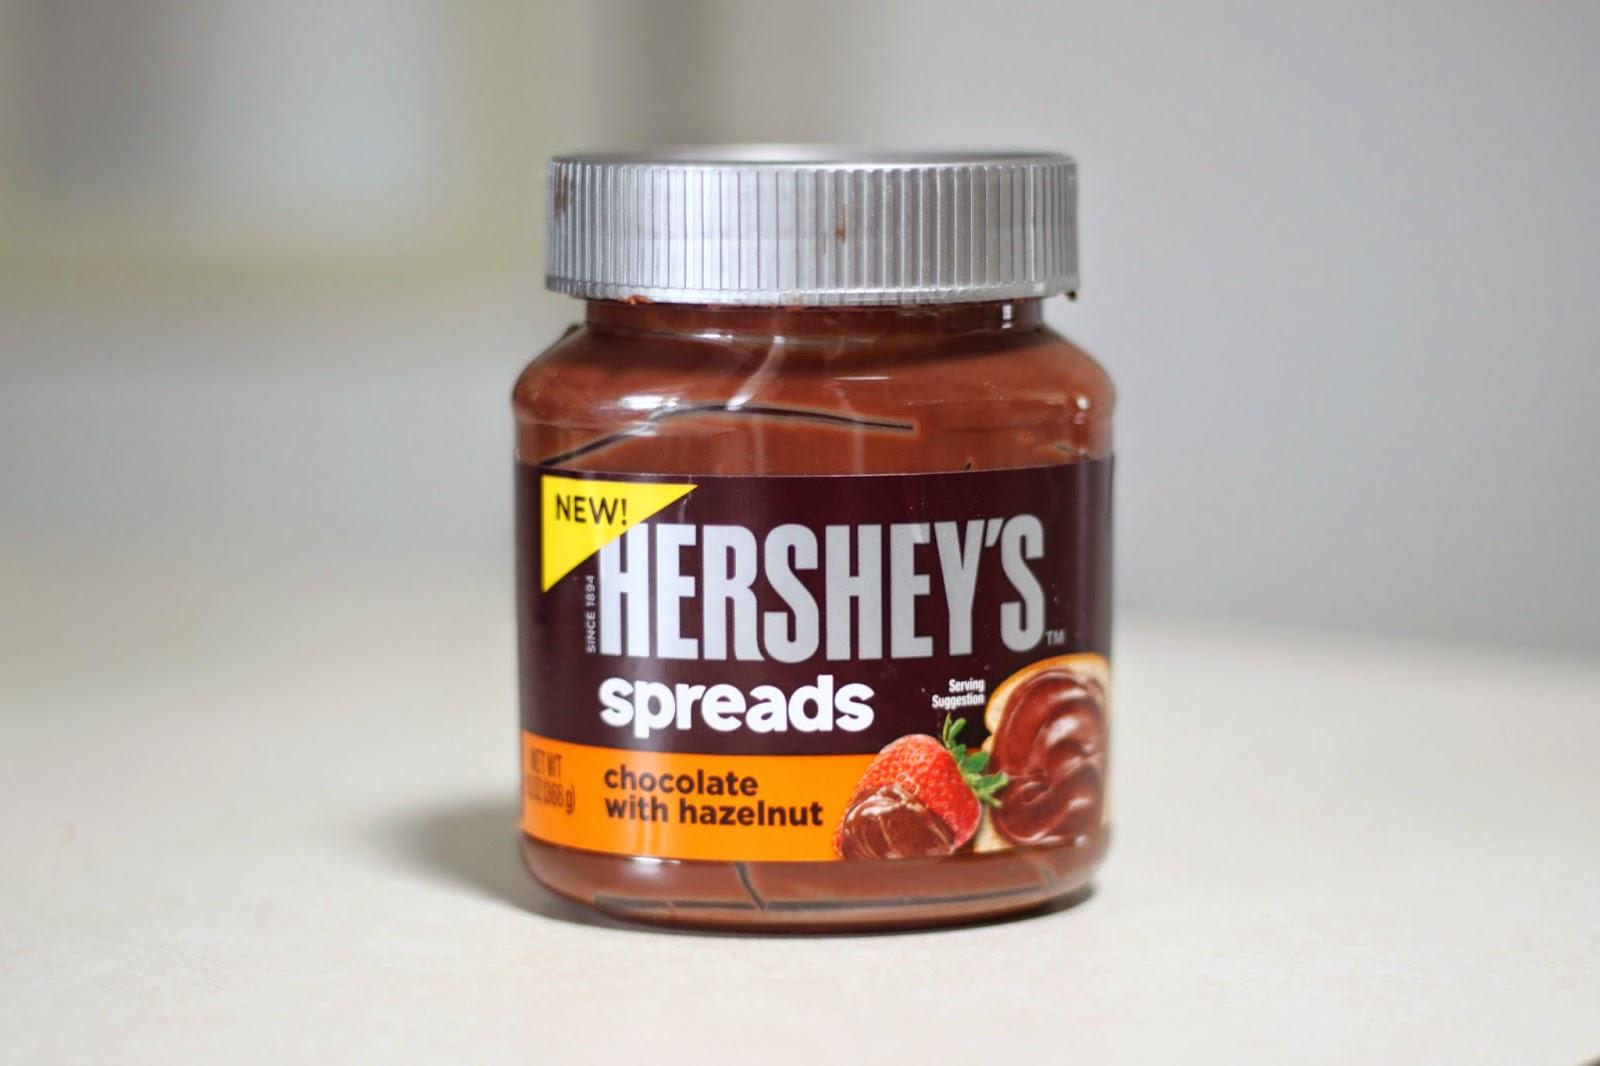 Nutella is better hazelnut chocolate spread